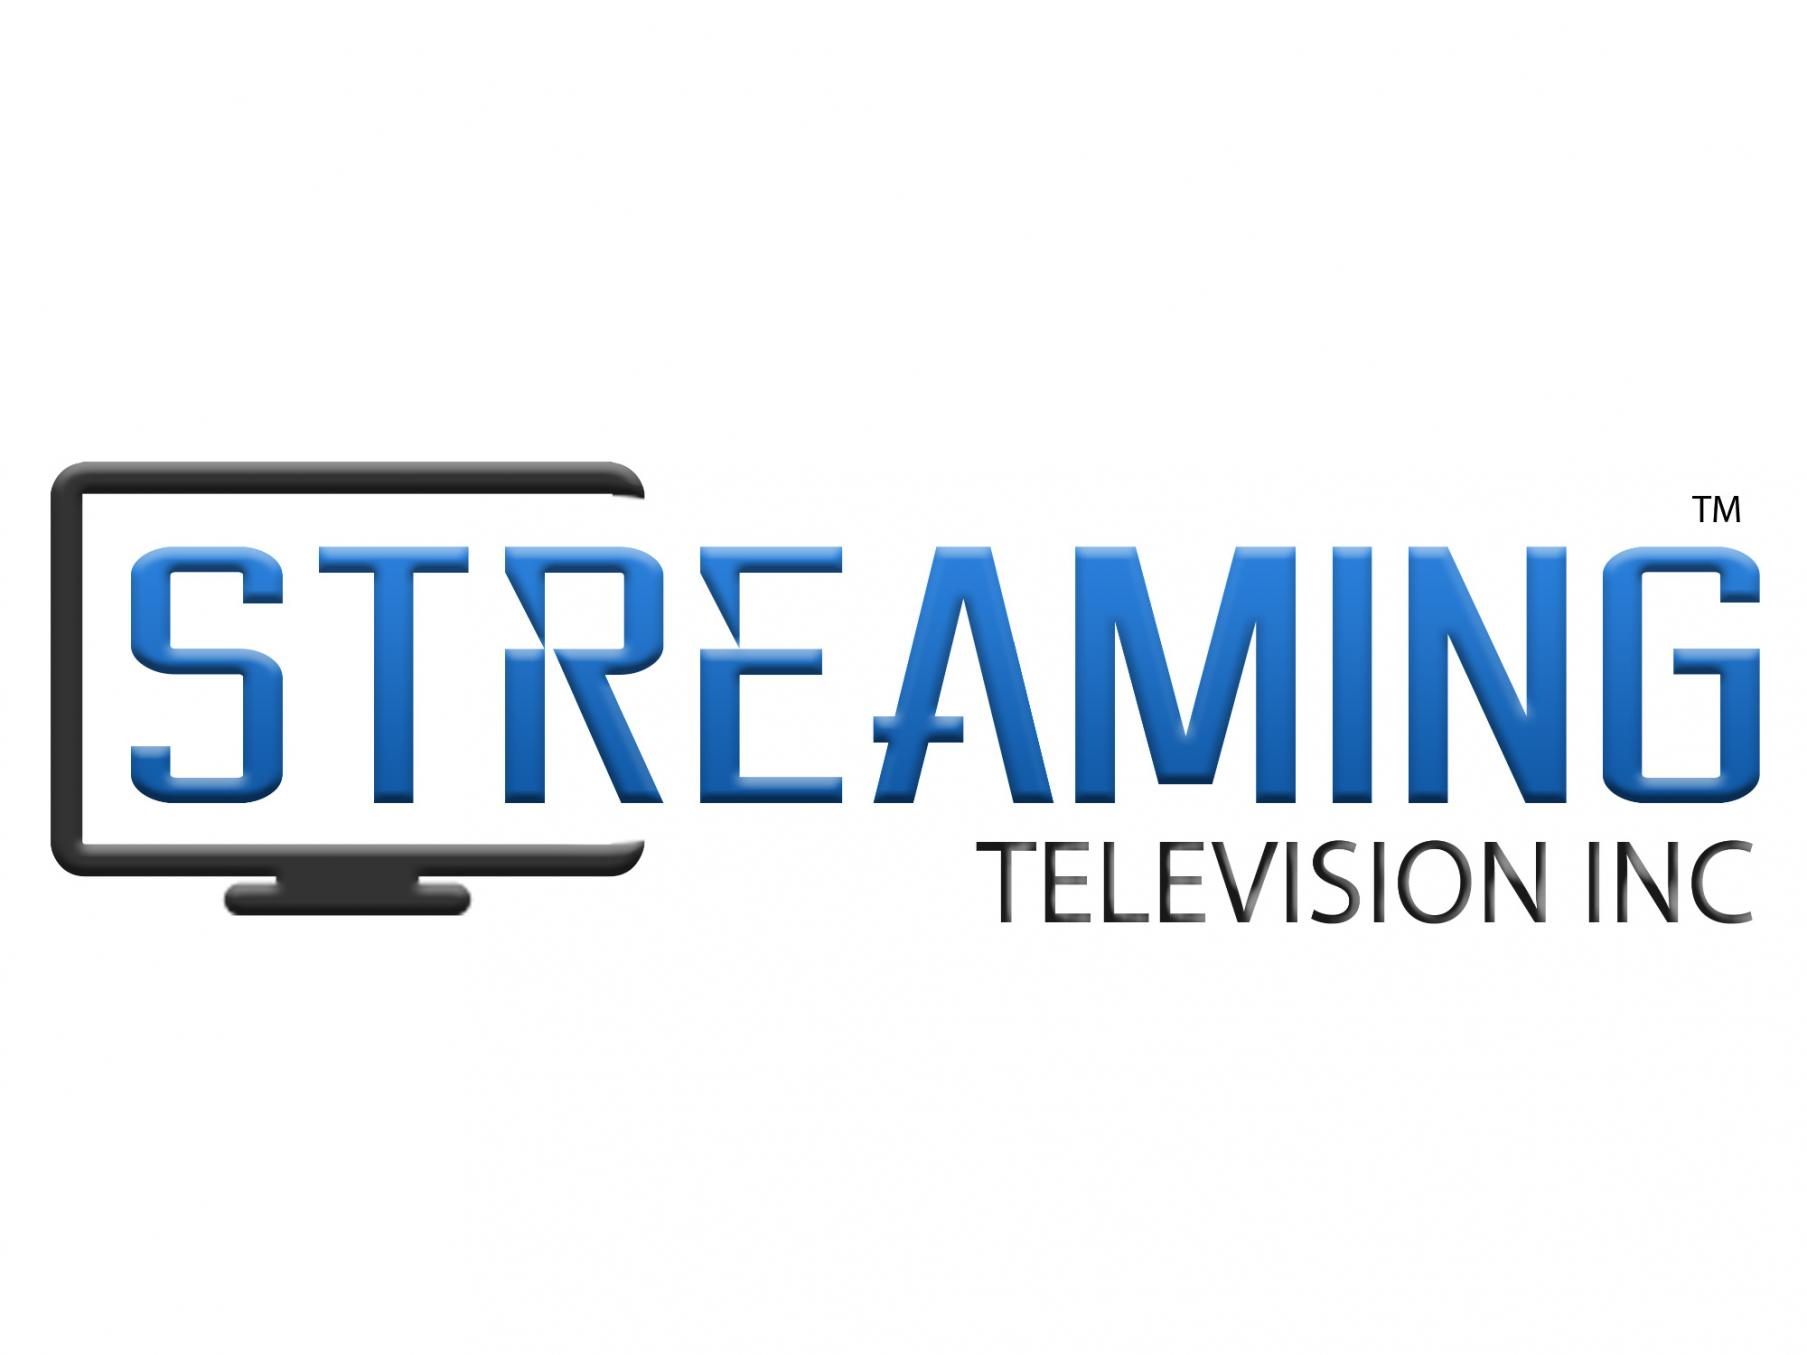 streamingtelevision Logo